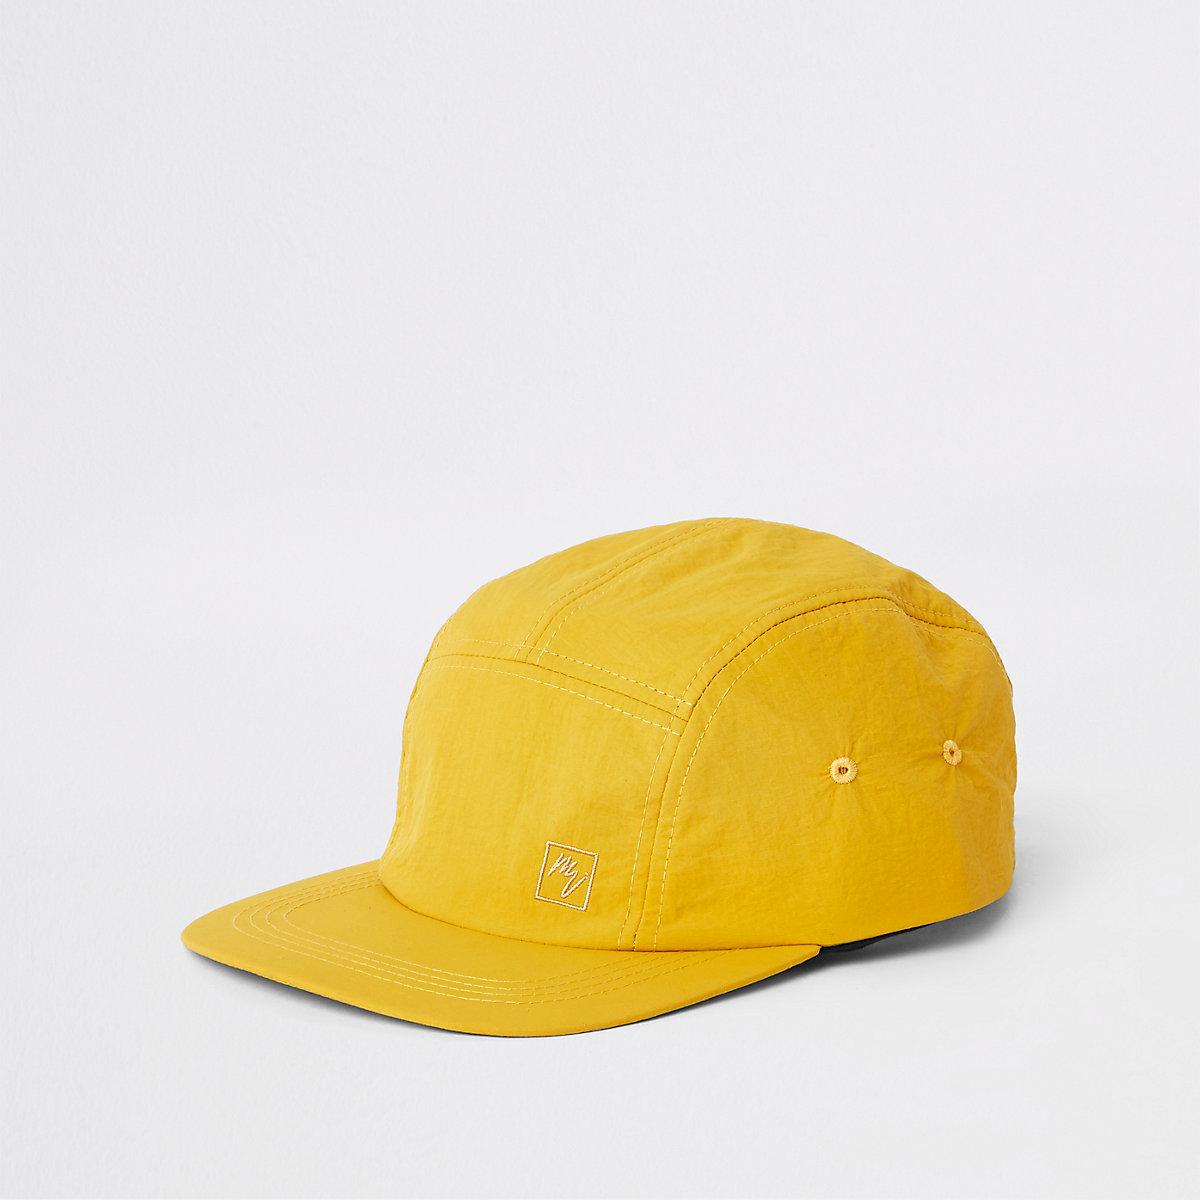 Yellow 'Maison Riviera' five panel cap